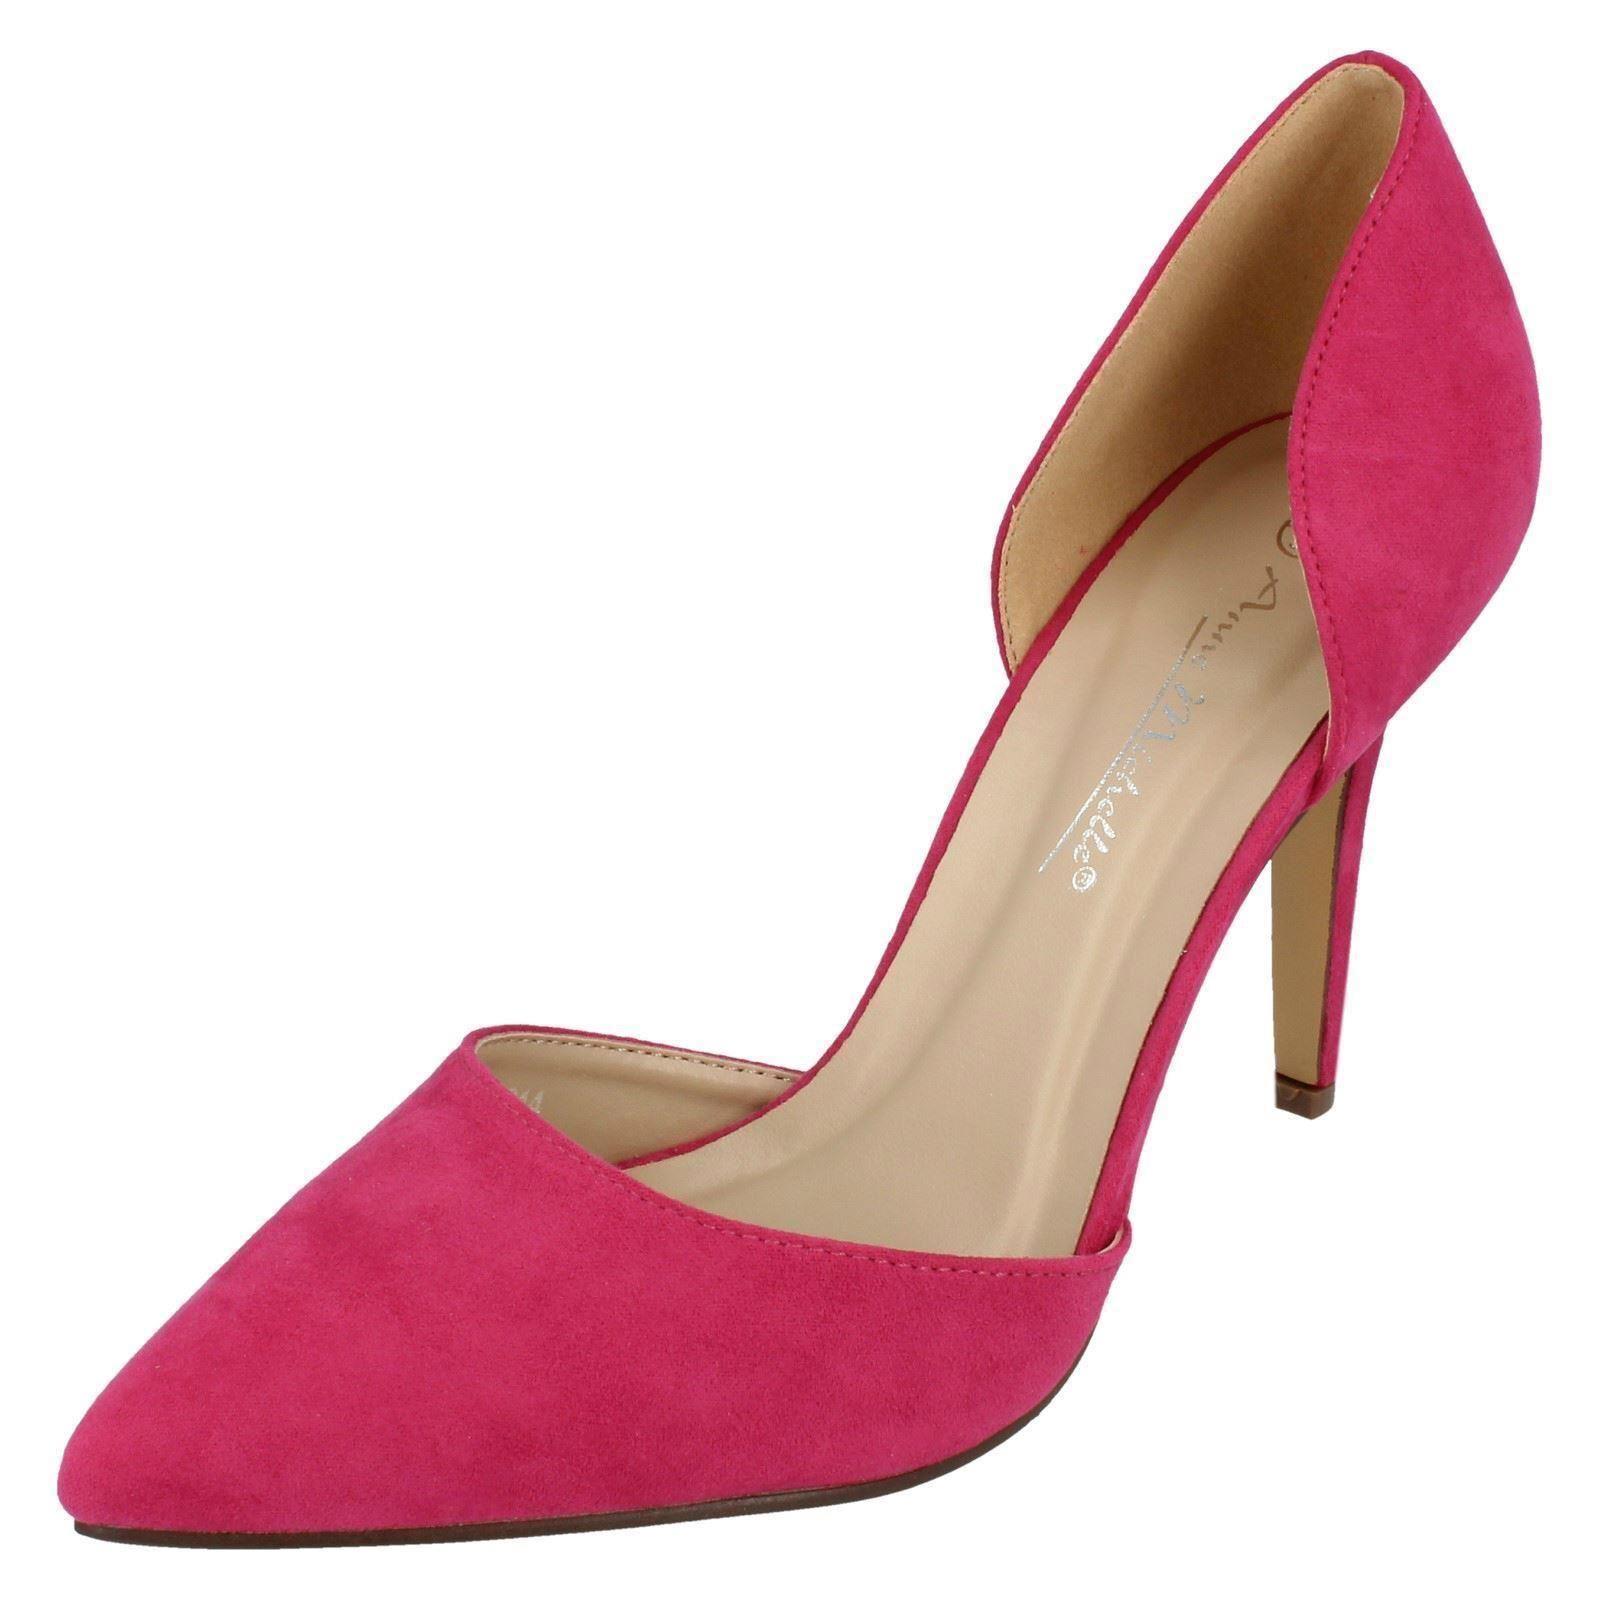 Anne Michelle F9914 Ladies 8 Fuchsia/Microfibre Court Shoes to 8 Ladies (R1B) e6a2e6